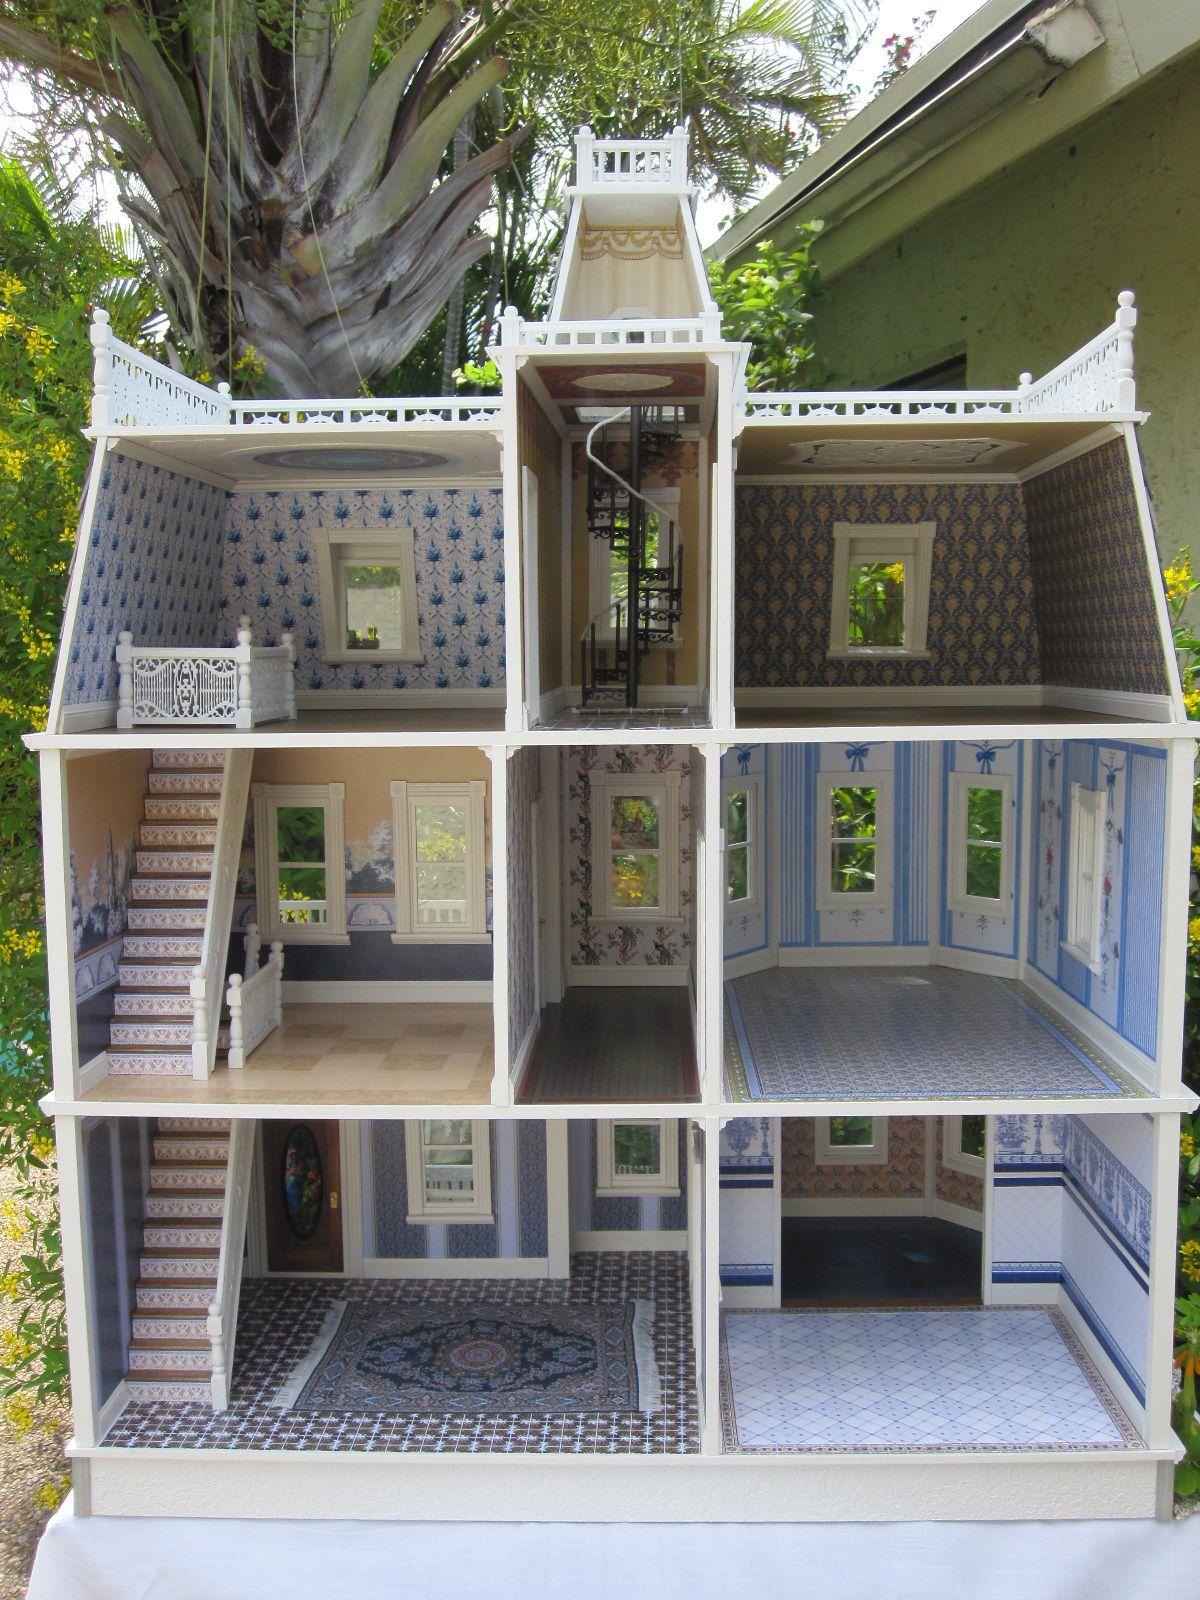 The Key West Island Manor Dollhouse 画像あり ドールハウス